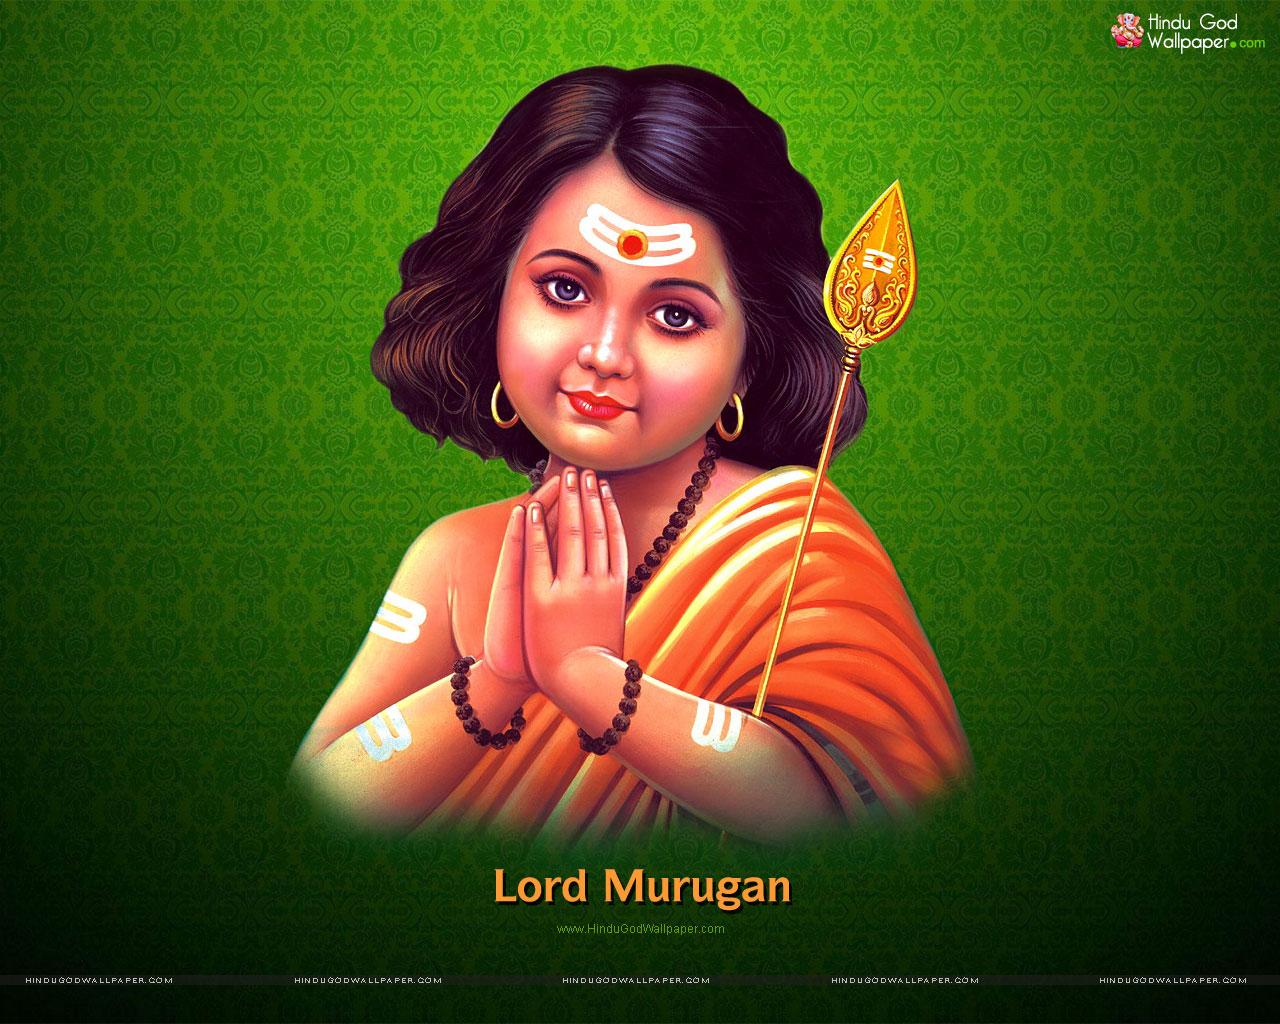 Bala murugan wallpapers images free download altavistaventures Image collections